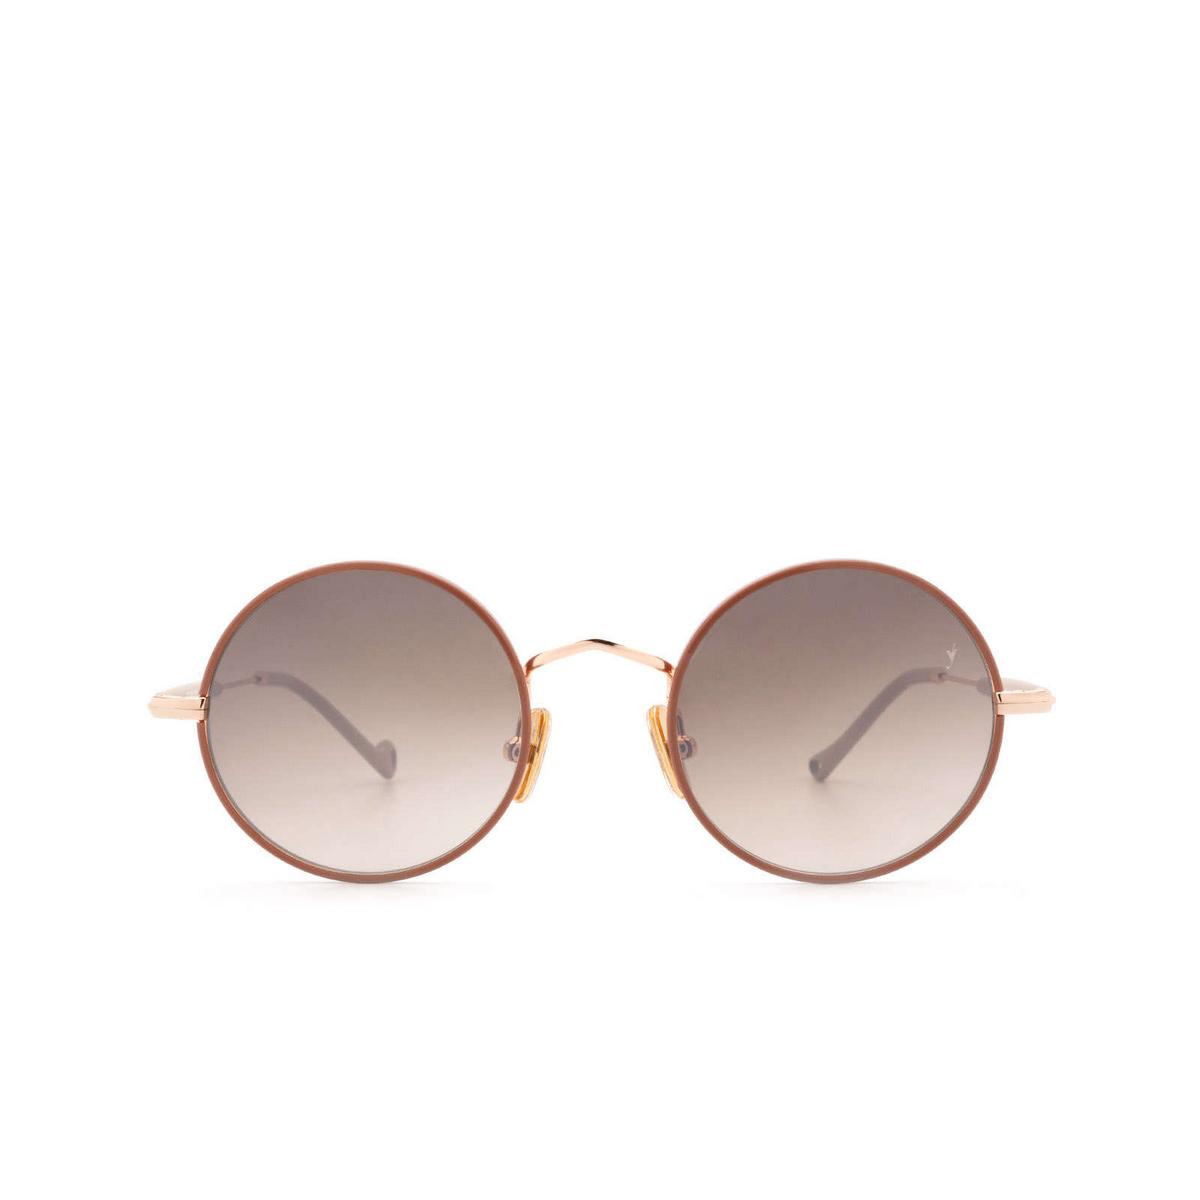 Eyepetizer® Round Sunglasses: Quatre color Pinkish Brown C.9-E-J-18F - front view.